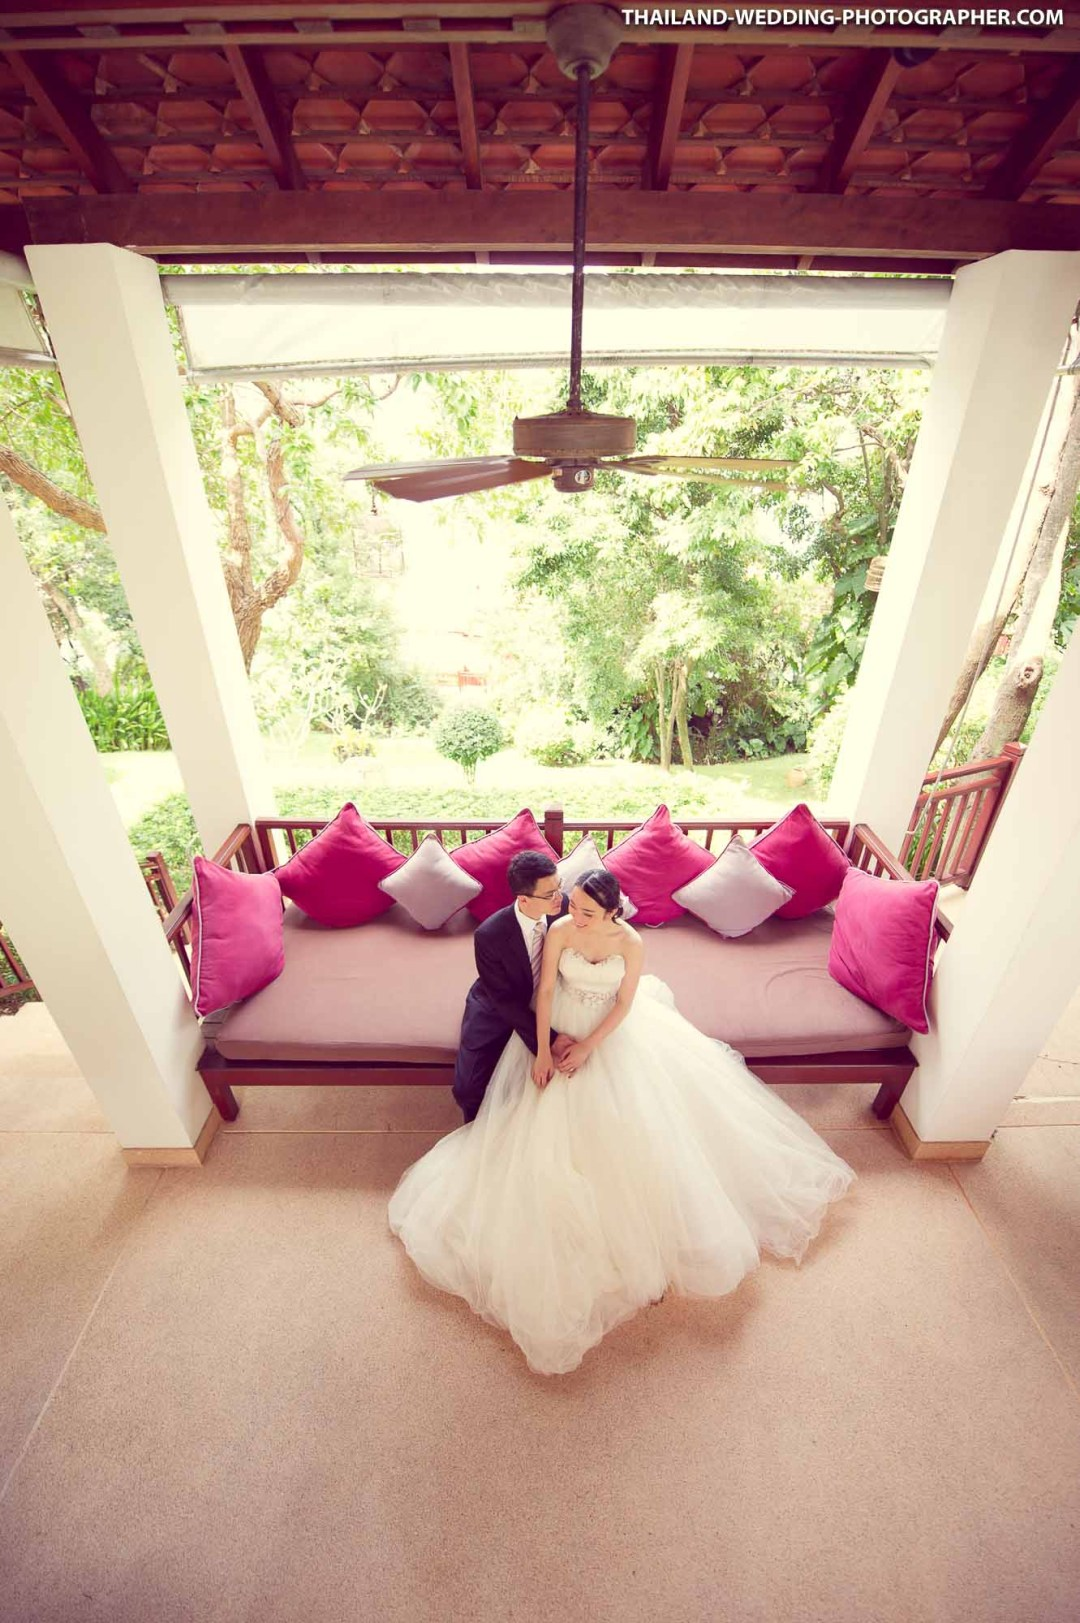 Napasai Hotel Koh Samui Thailand Wedding Photography